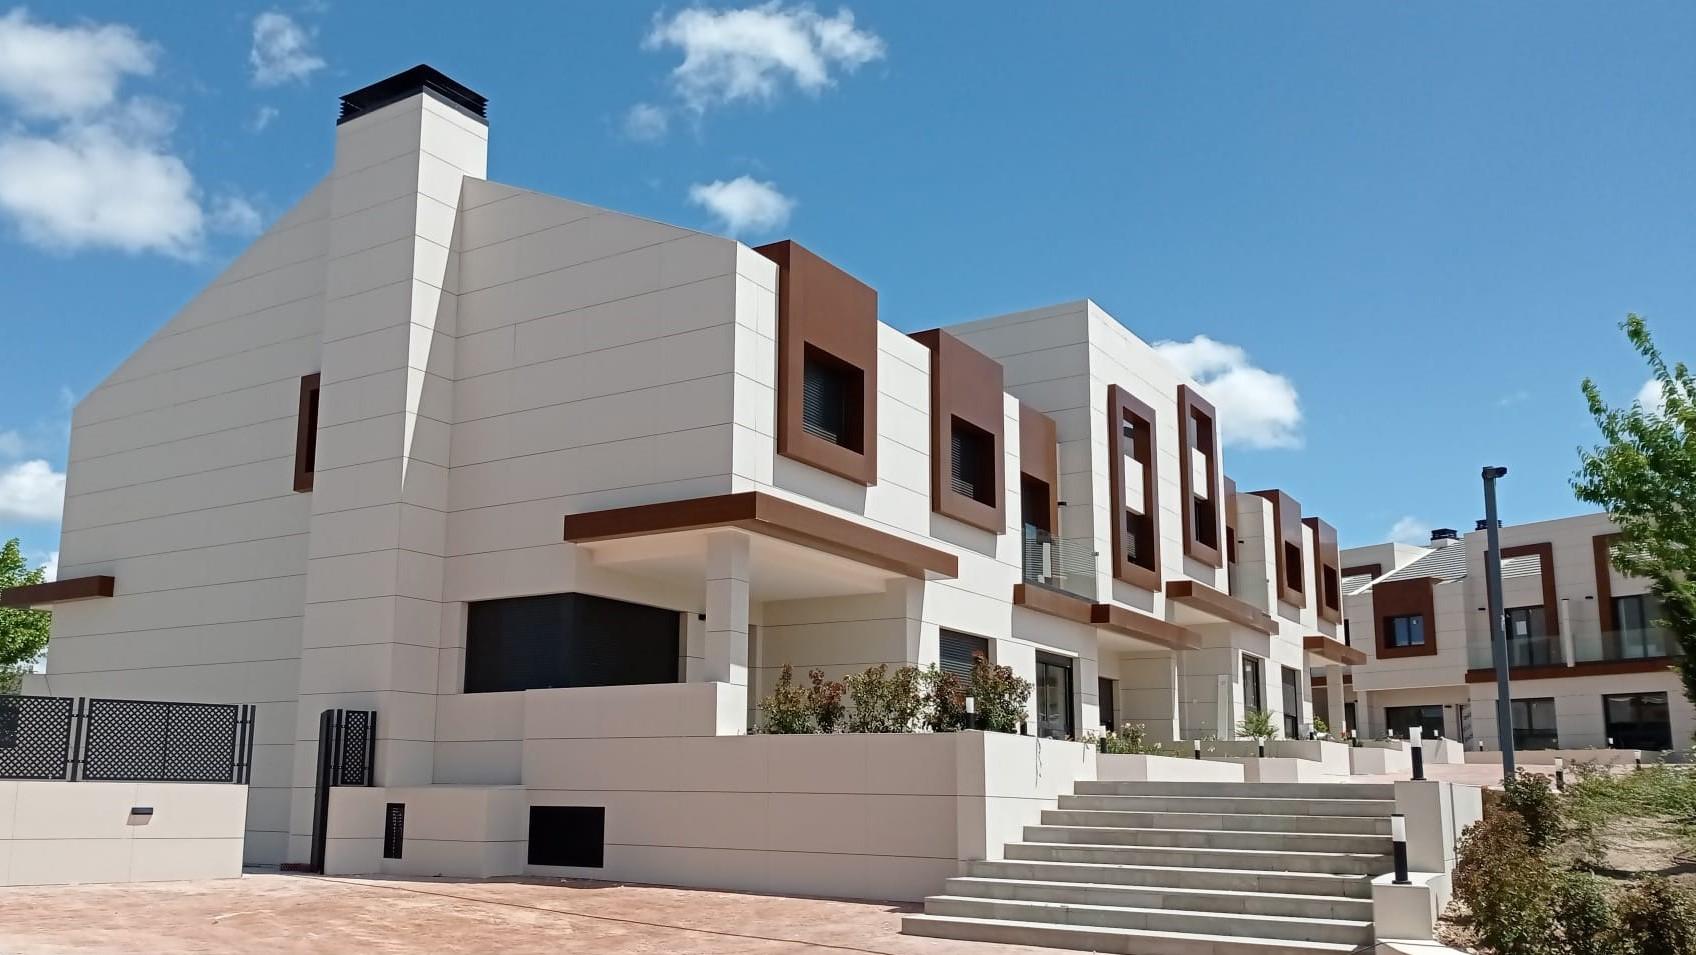 VillasMirabal-Boadilla-IMER